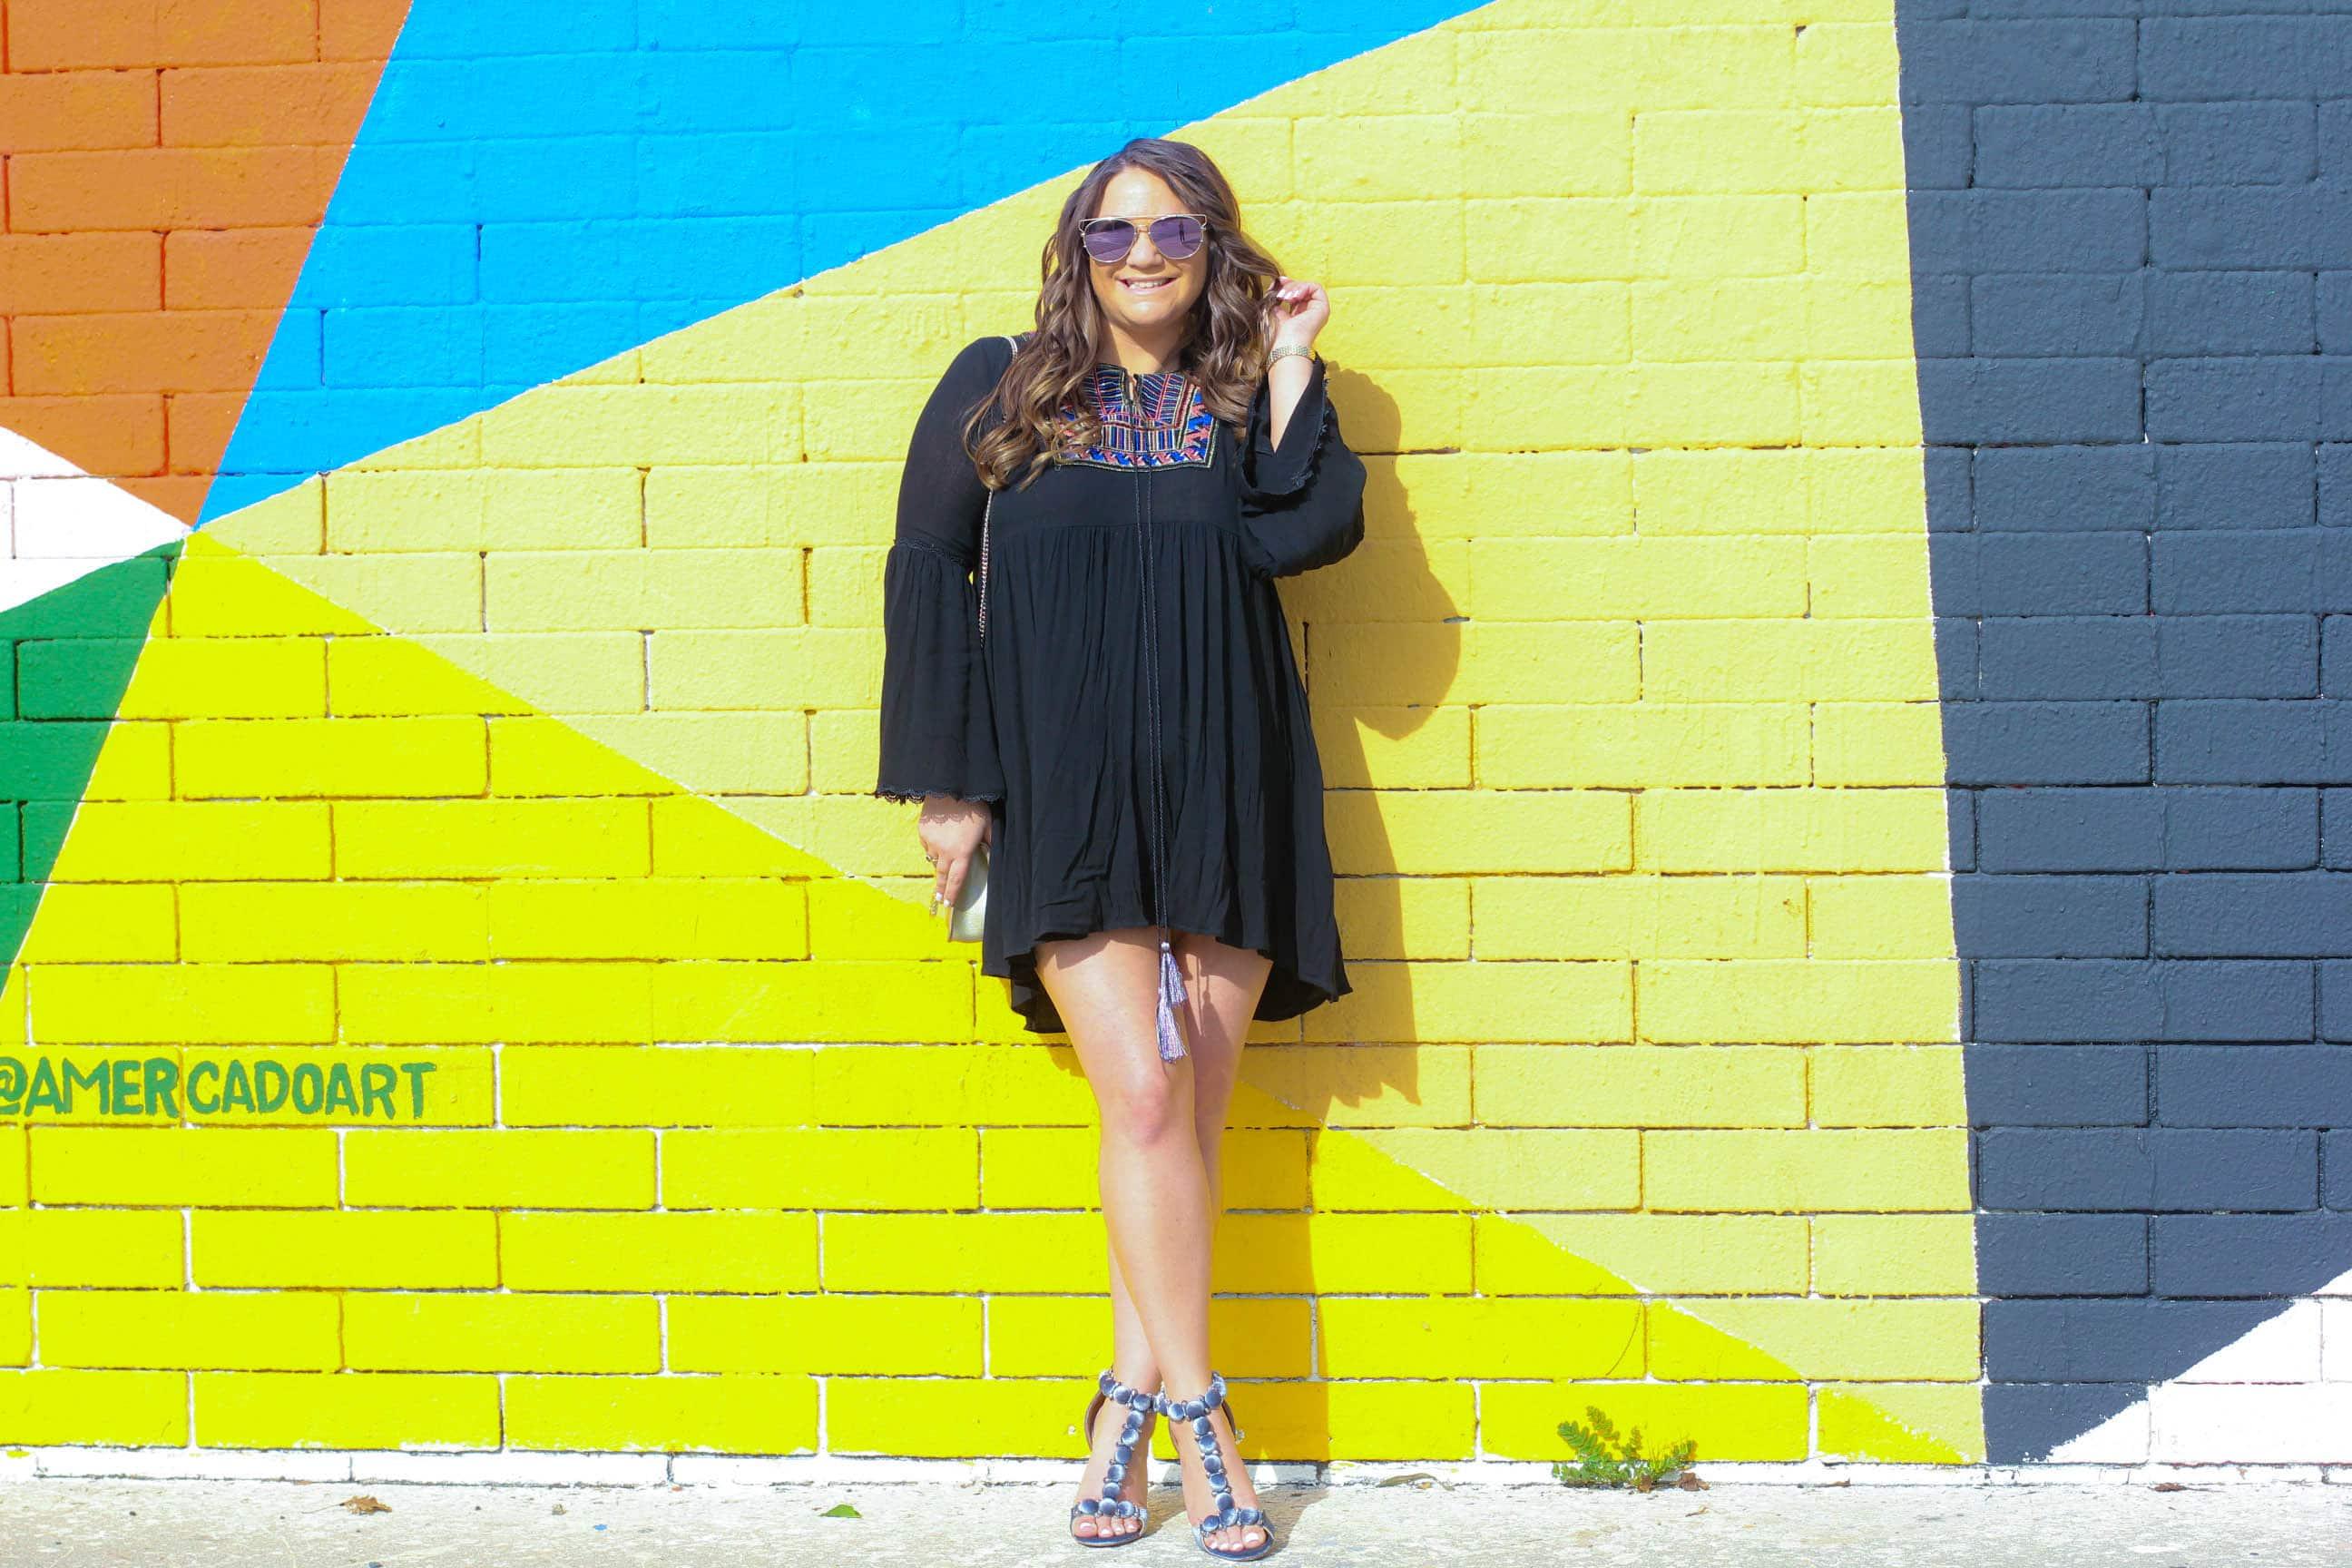 missyonmadison, melissa tierney, high heels, she is chic, she is shic, shoe goals, strappy sandals, fashion blogger, style blogger, la blogger, black tribal dress, shein, black embroidered dress, mirrored aviators, gold bag, gold crossbody bag, la walls, wall crawl, la murals, la street art,